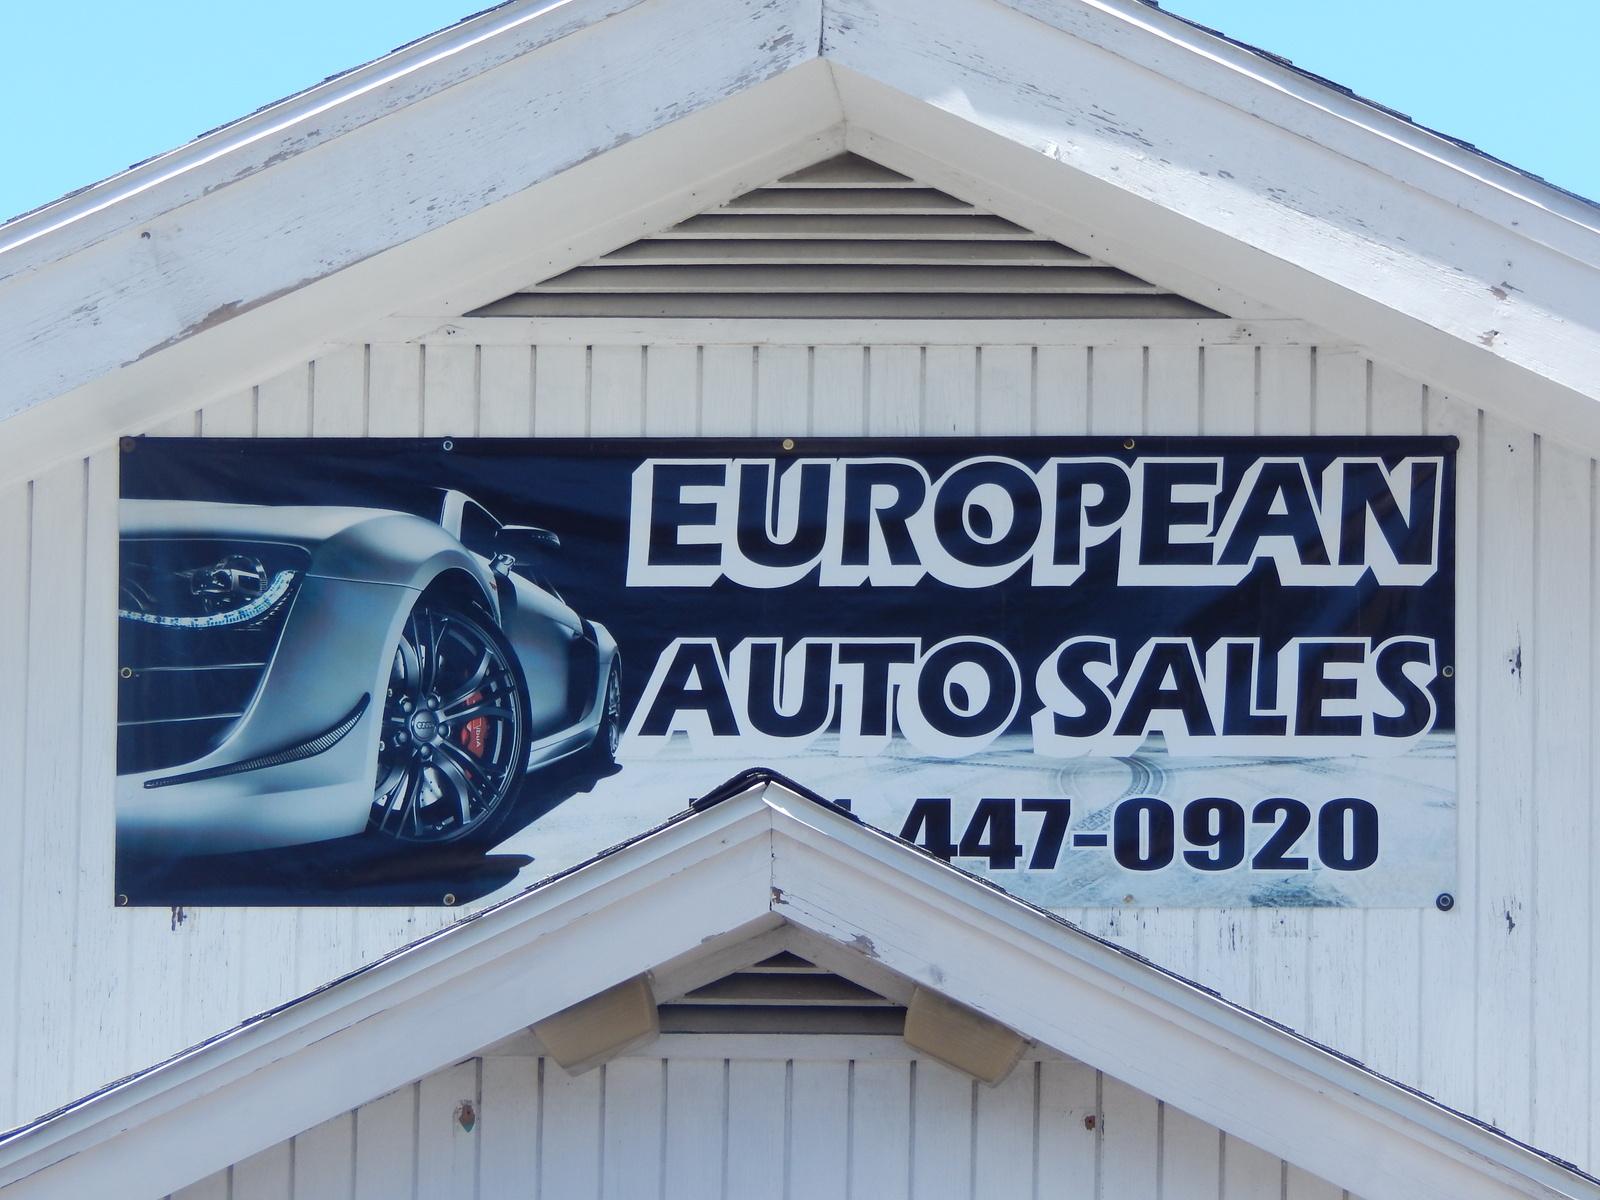 Gmc Dealers In Ma >> European Auto Sales - Whitman, MA: Read Consumer reviews